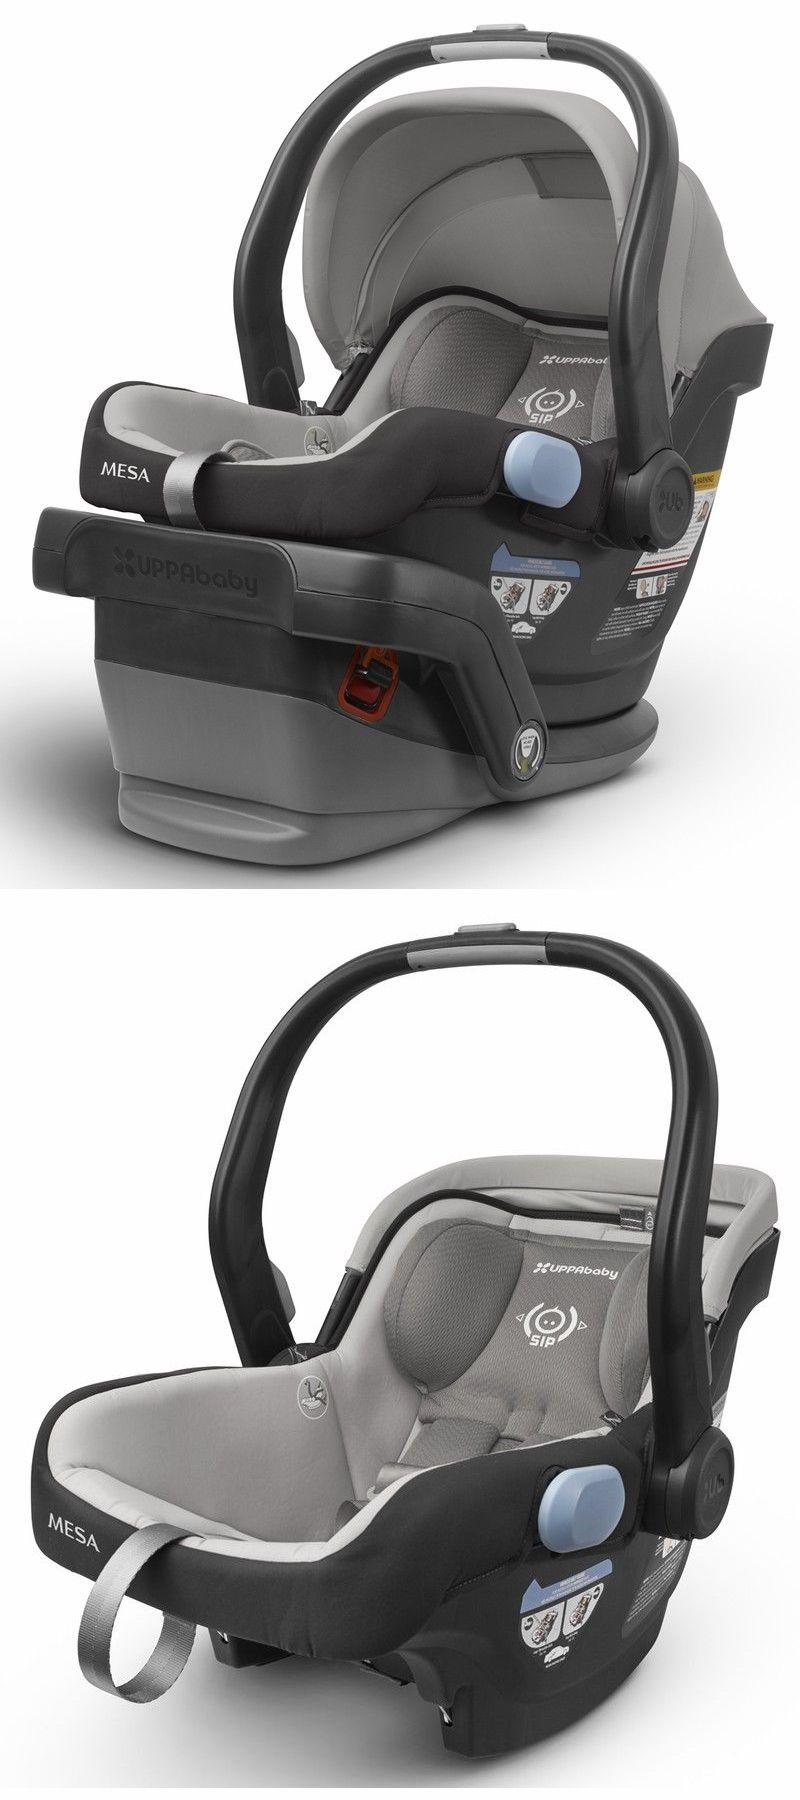 Car Safety Seats 66692 Uppababy Mesa Infant Car Seat Pascal Gray